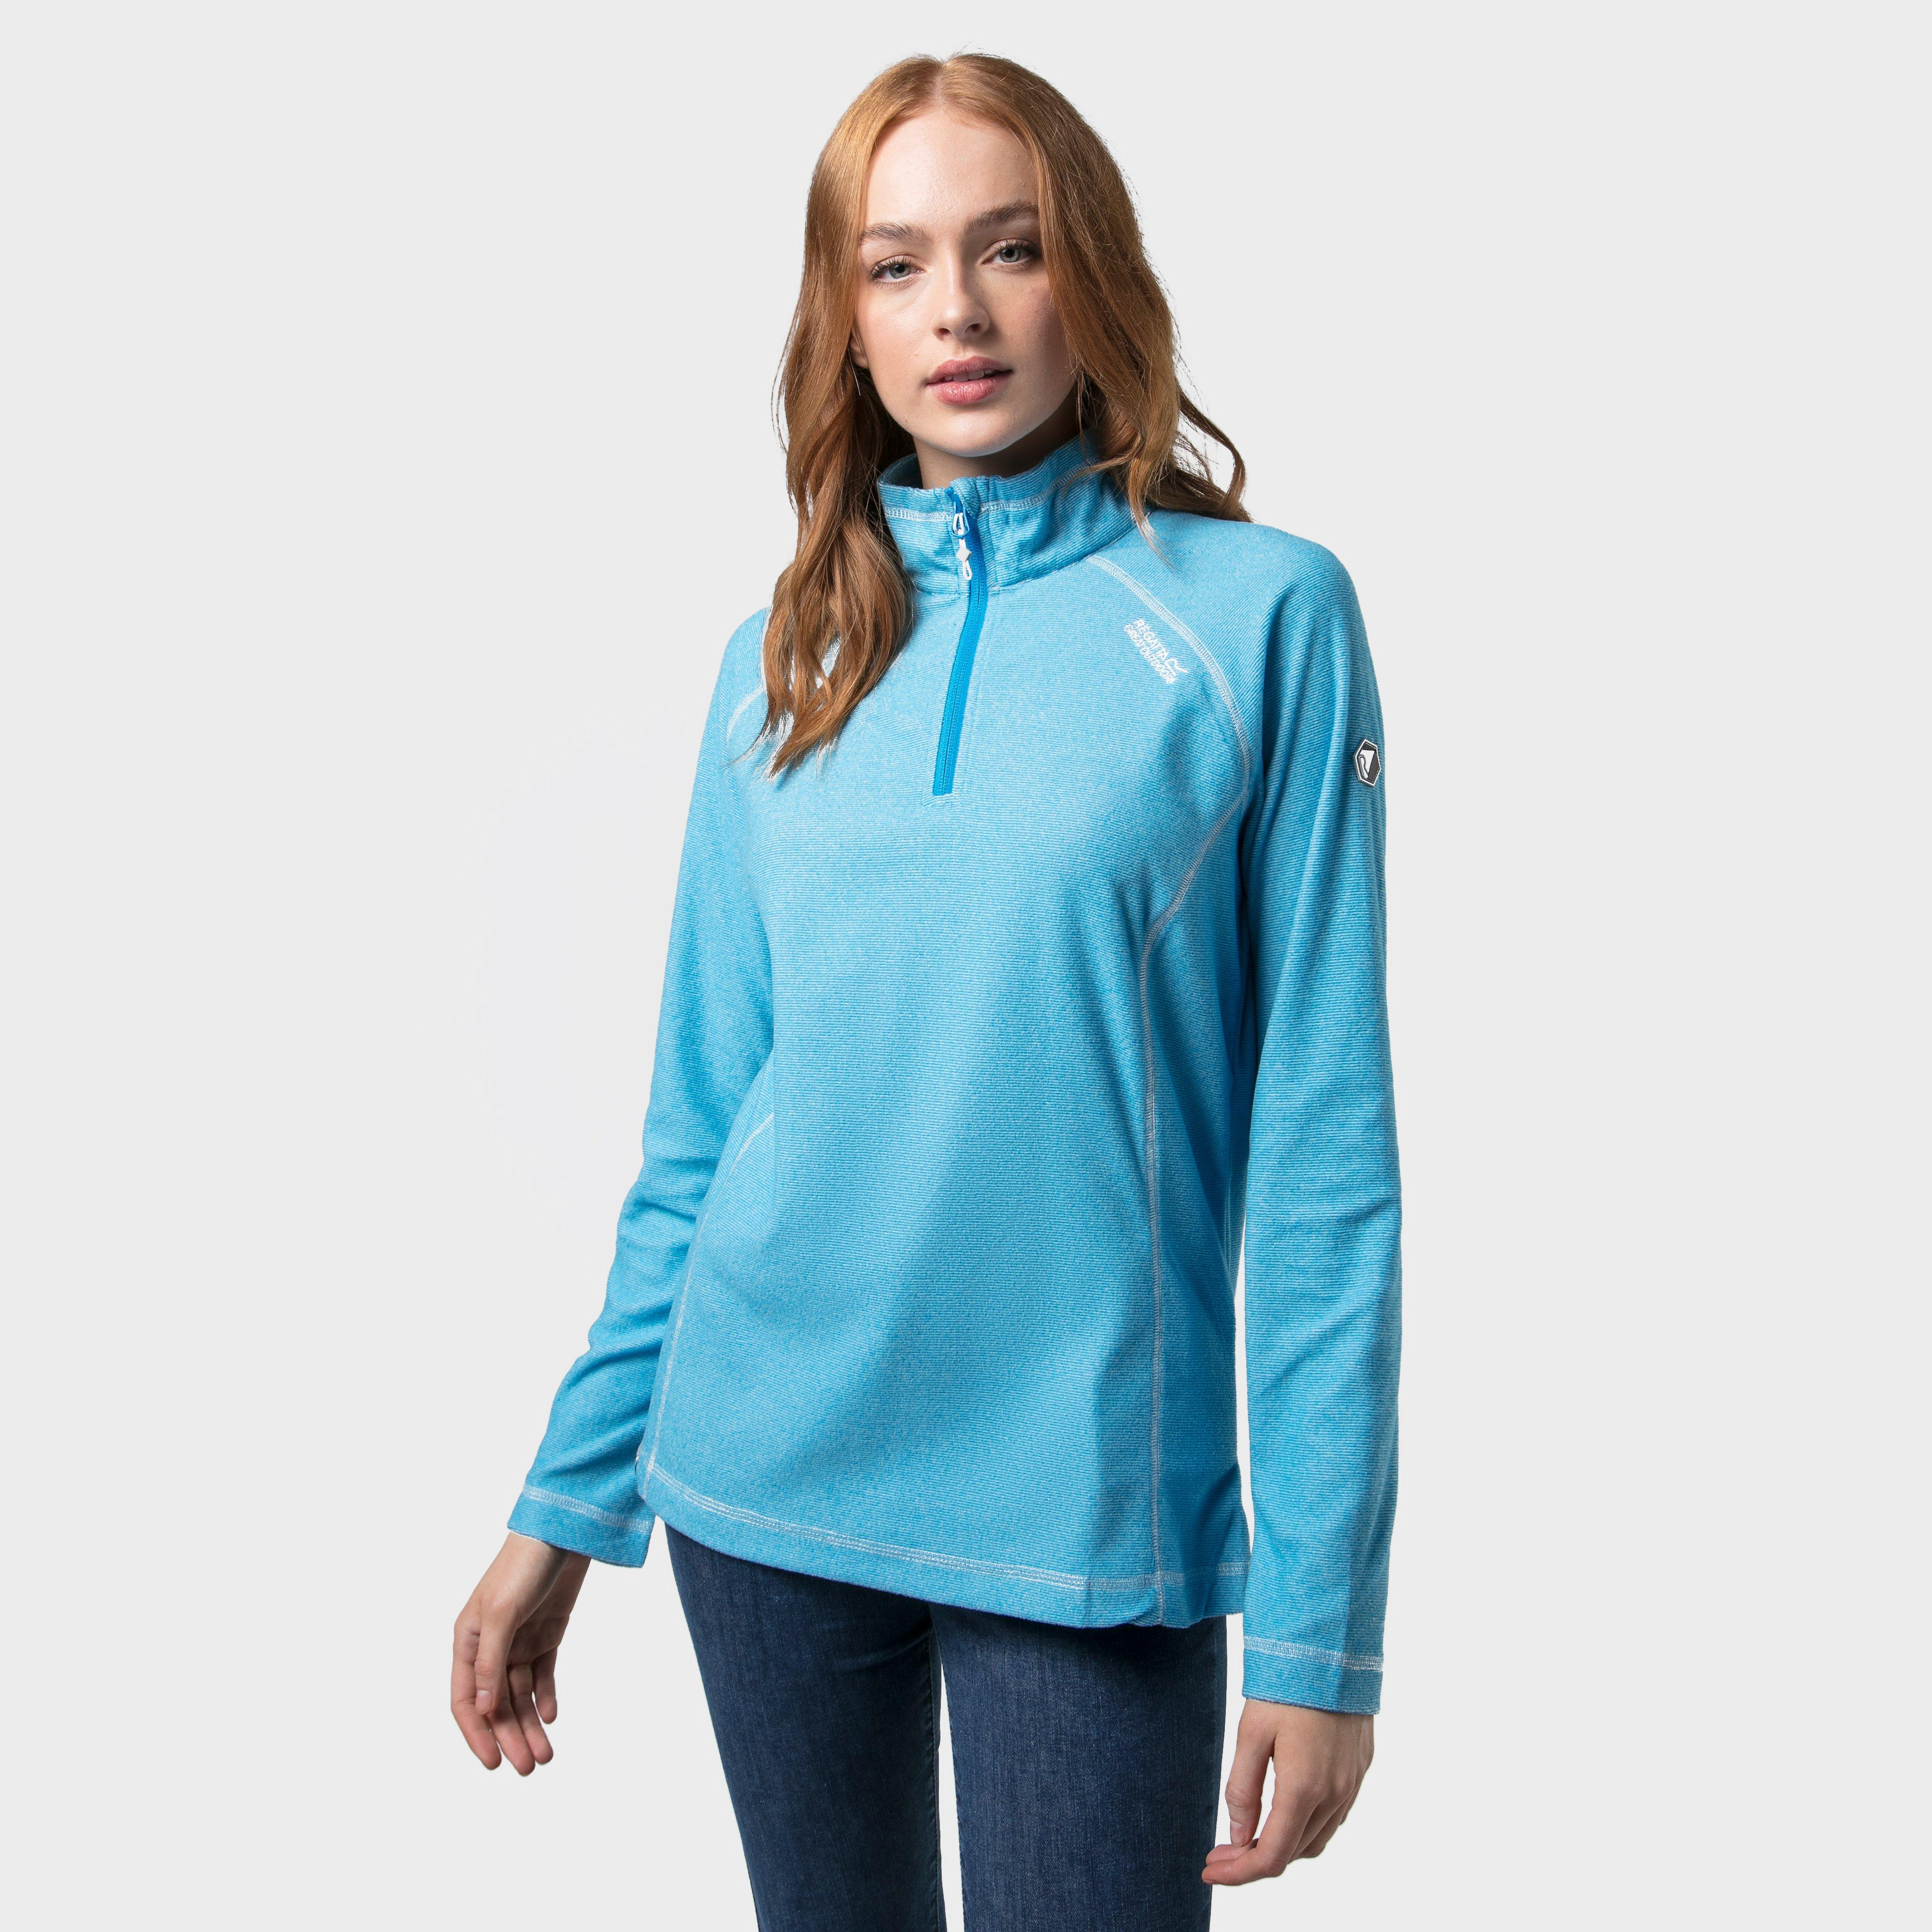 Regatta Regatta Womens Montes Lightweight Half-Zip Fleece, Turquoise